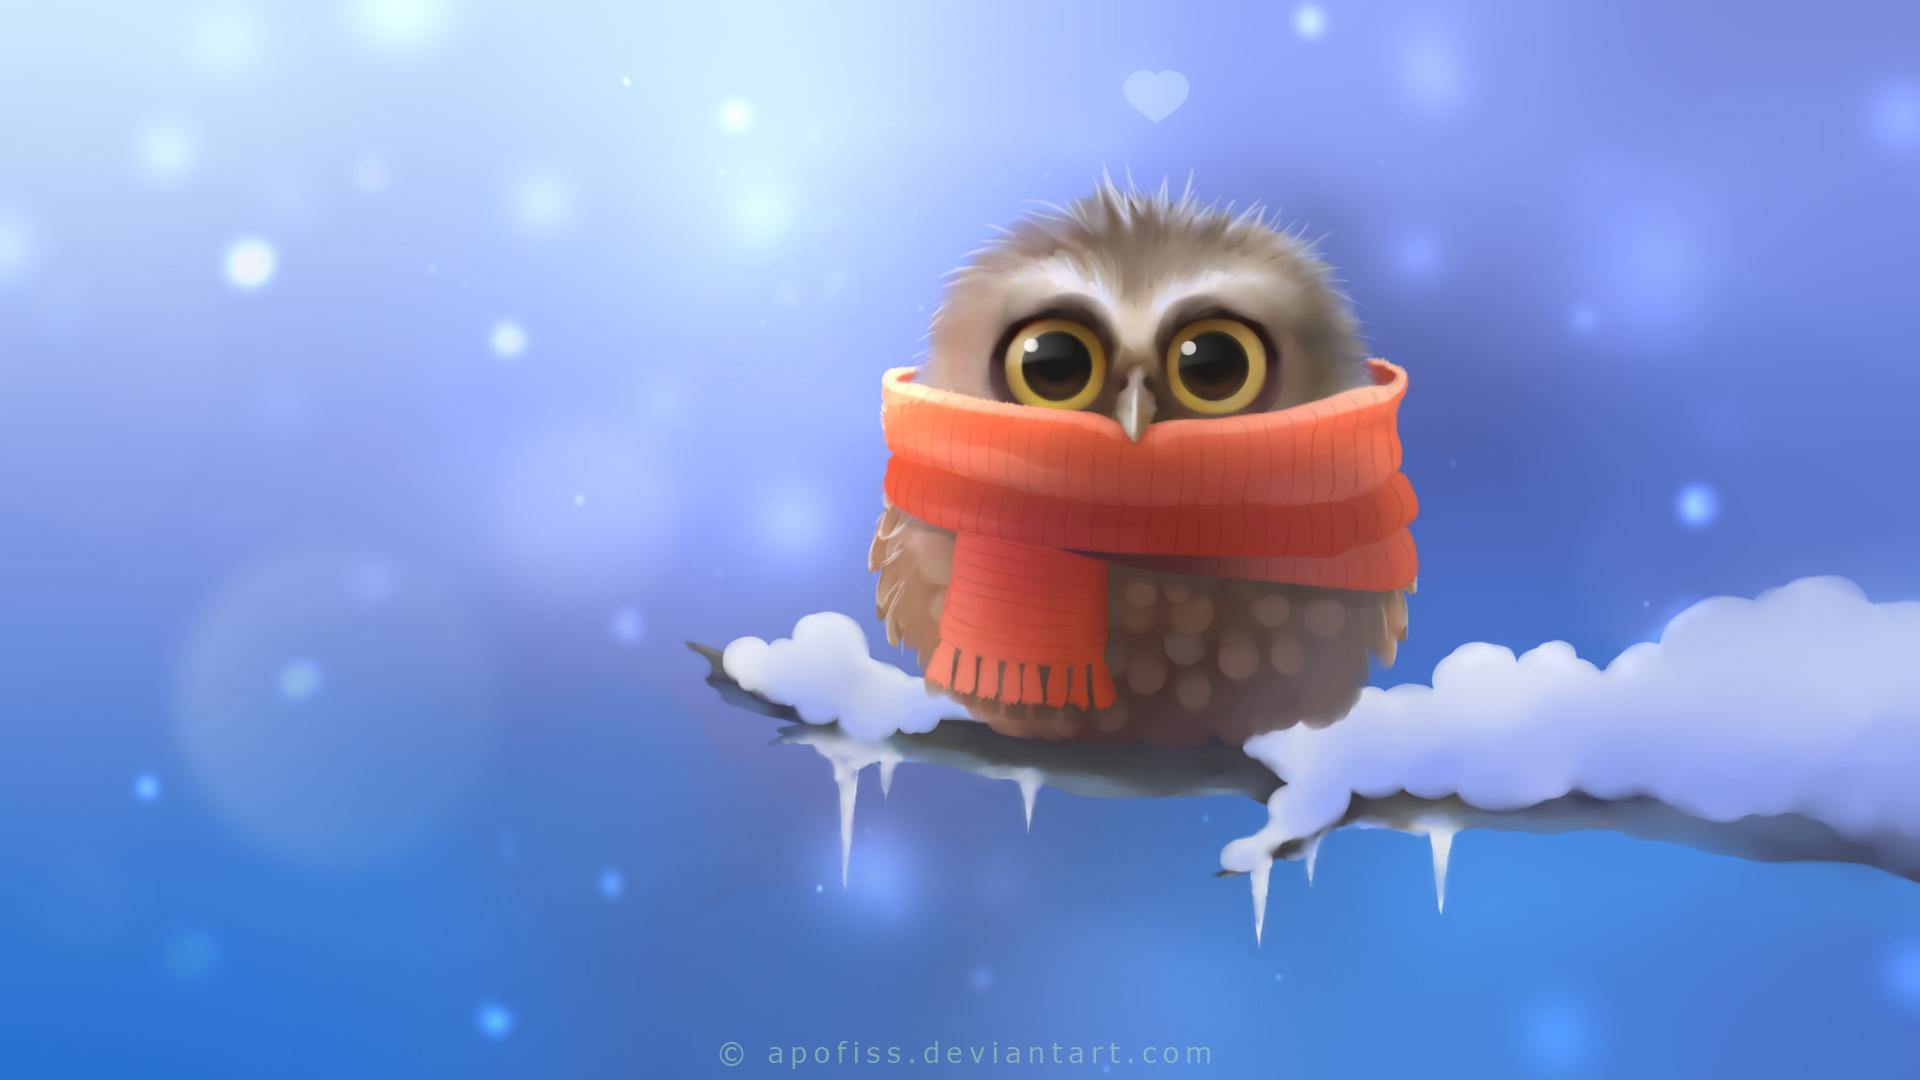 Little owl wallpaper cute adorable fluffy little owl on branch blue 1920x1080